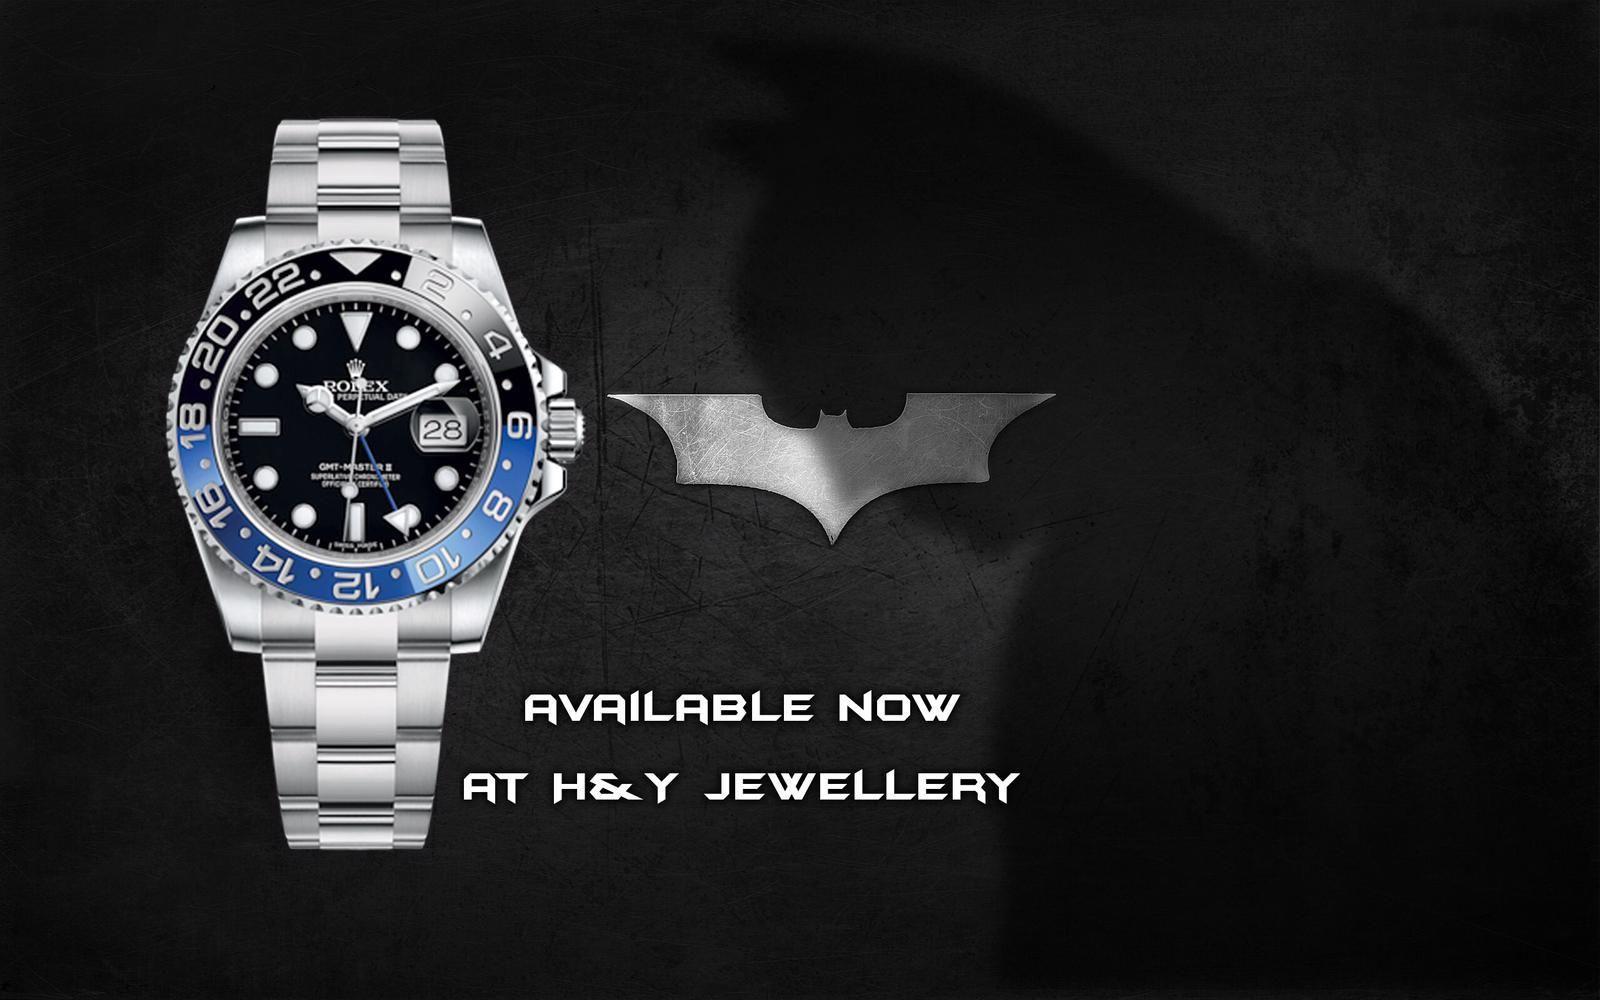 Rolex Gmt Master Batman Discontinued 116710blnr Rolex Gmt Master Ii Rolex Gmt Master Rolex Gmt